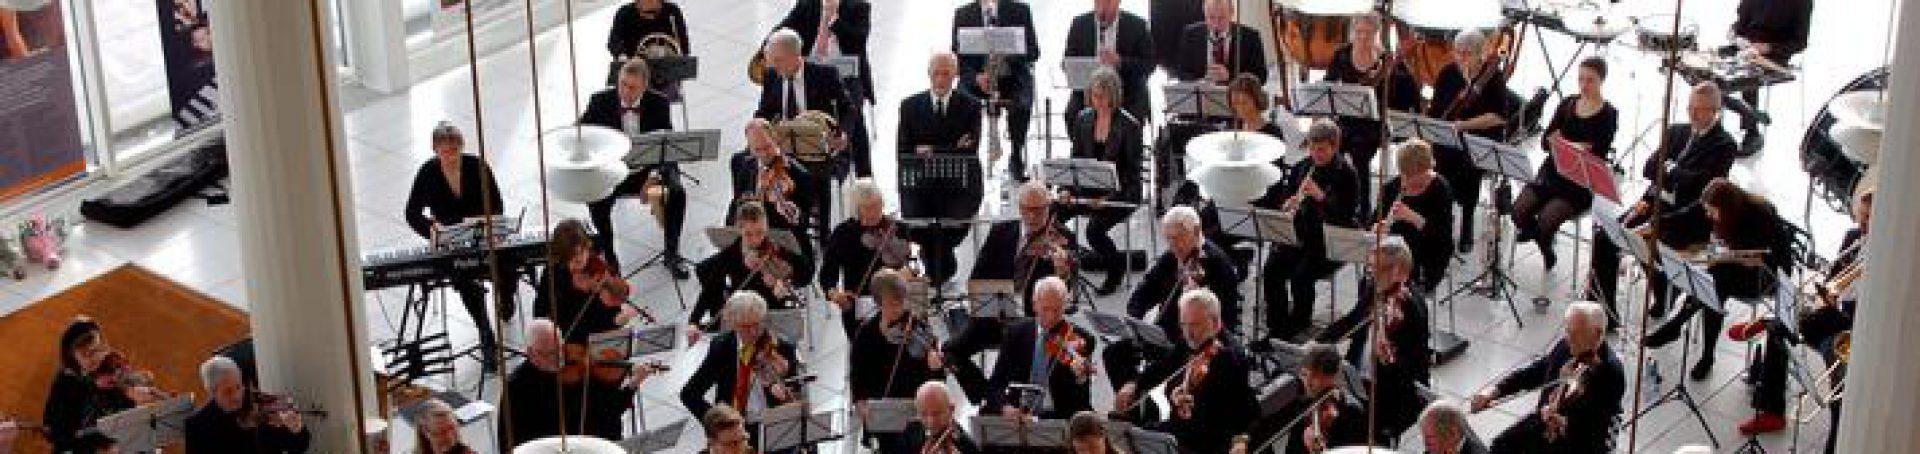 Århus Amatør symfoni orkester